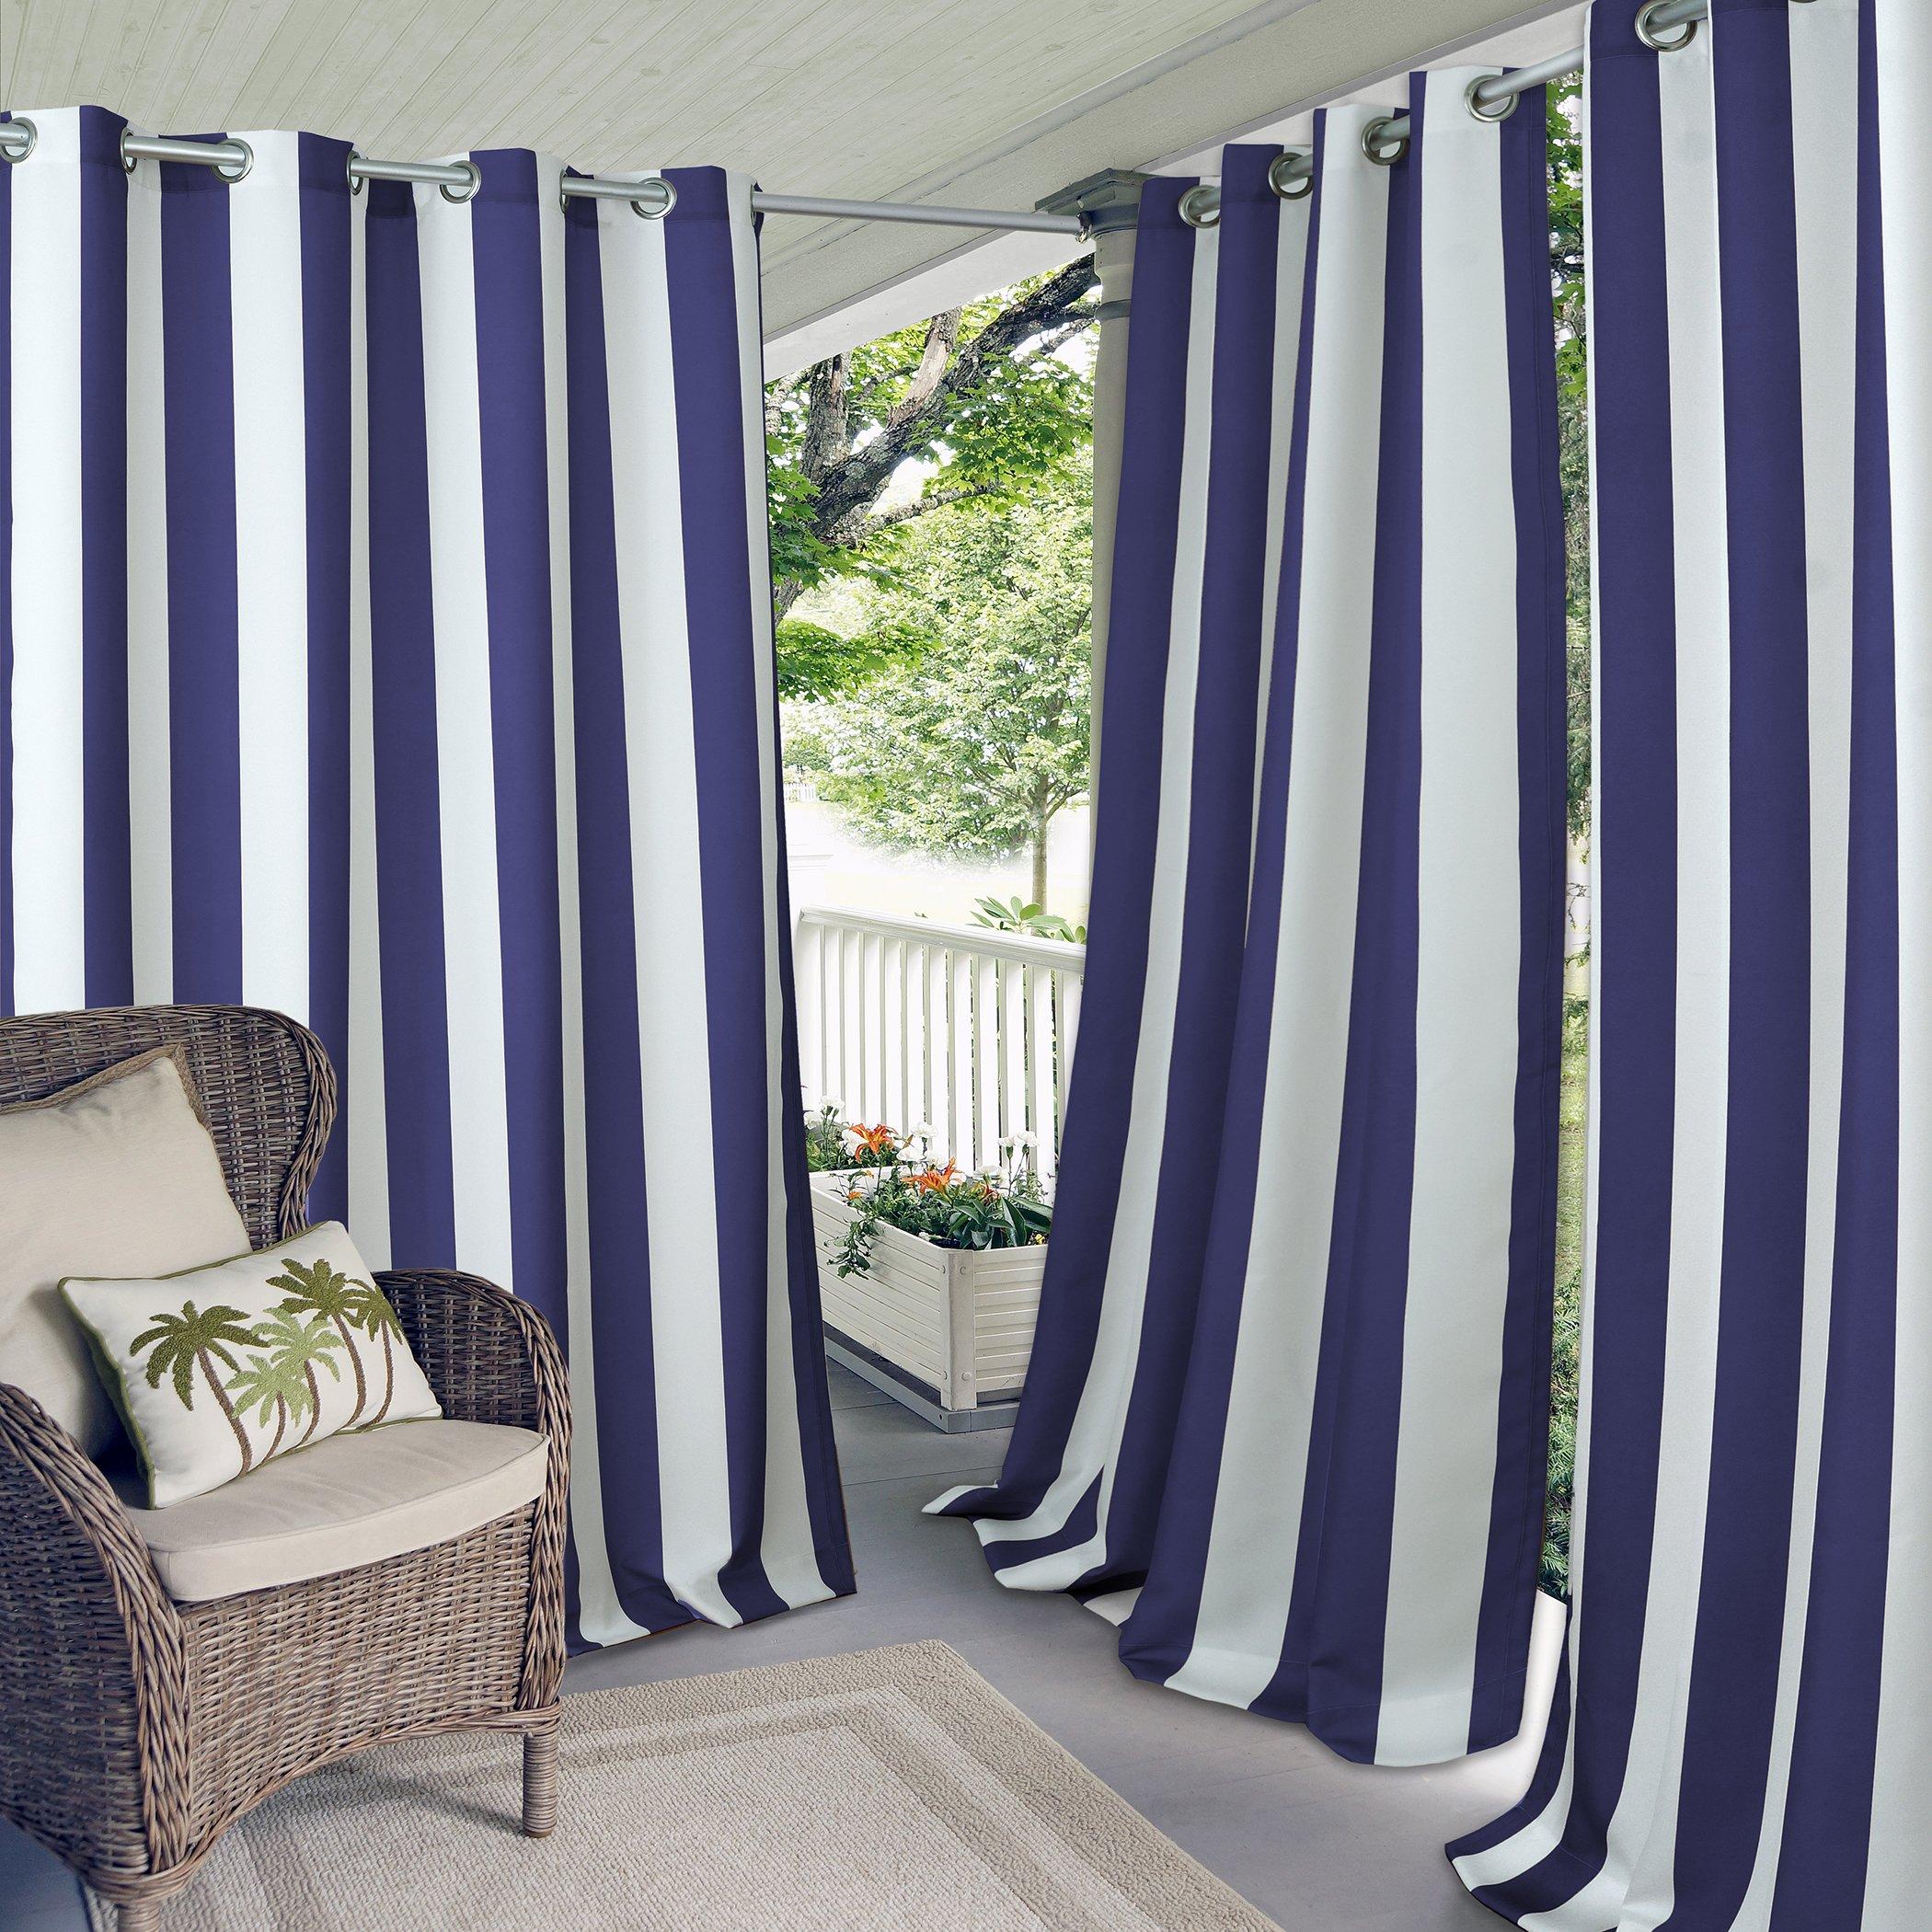 Elrene Home Fashions Indoor Outdoor Patio Gazebo Pergola